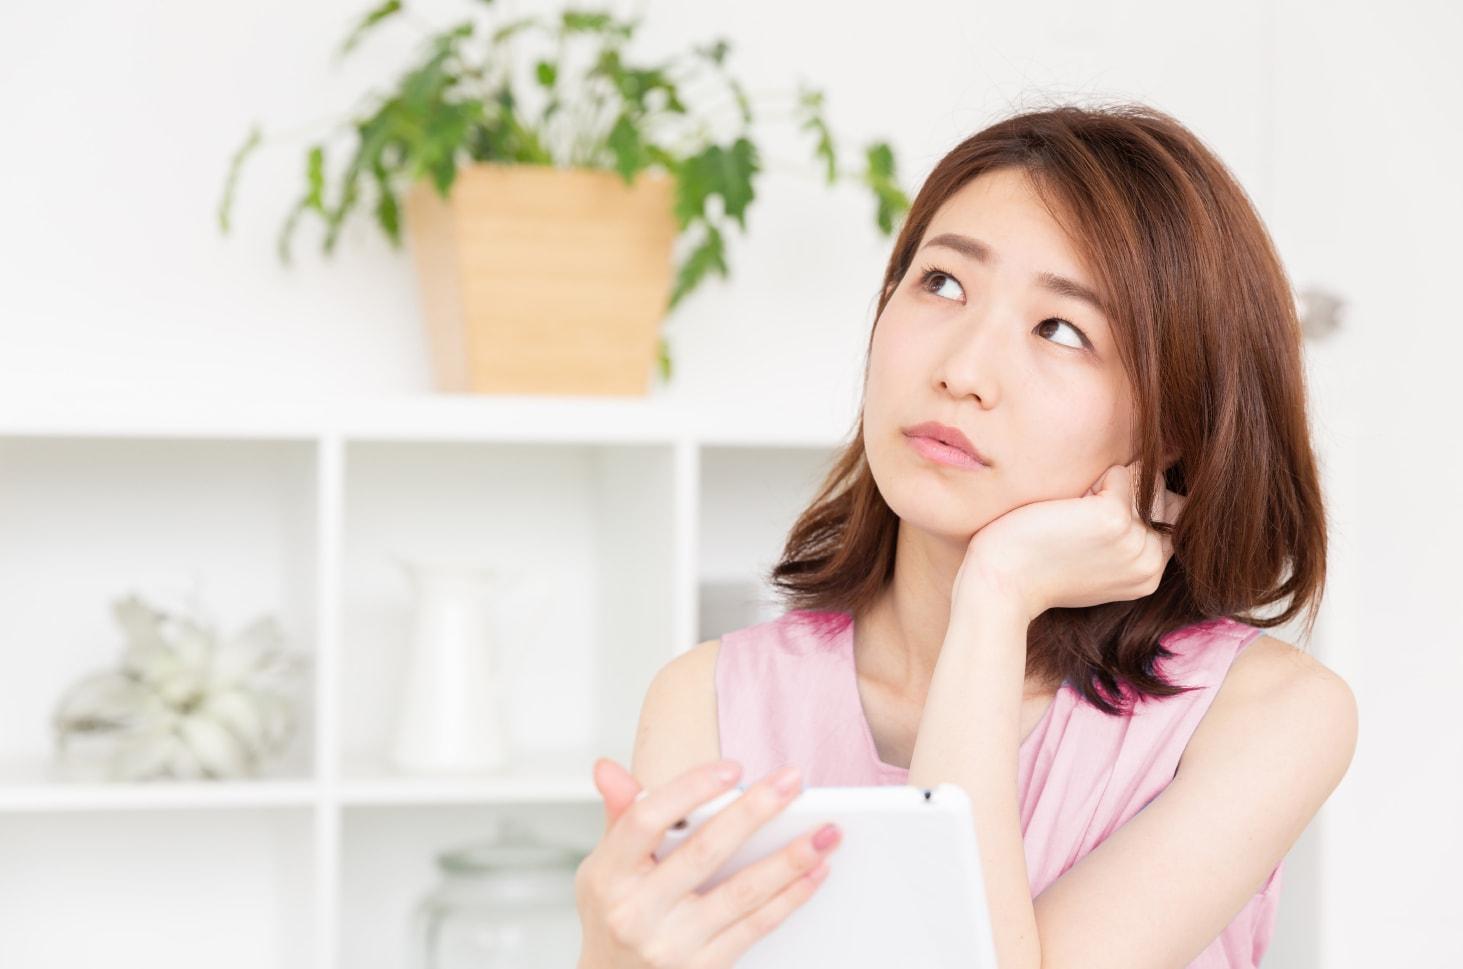 Bikin Pengidap Susah Tenang, Apa itu Sindrom Tourette?